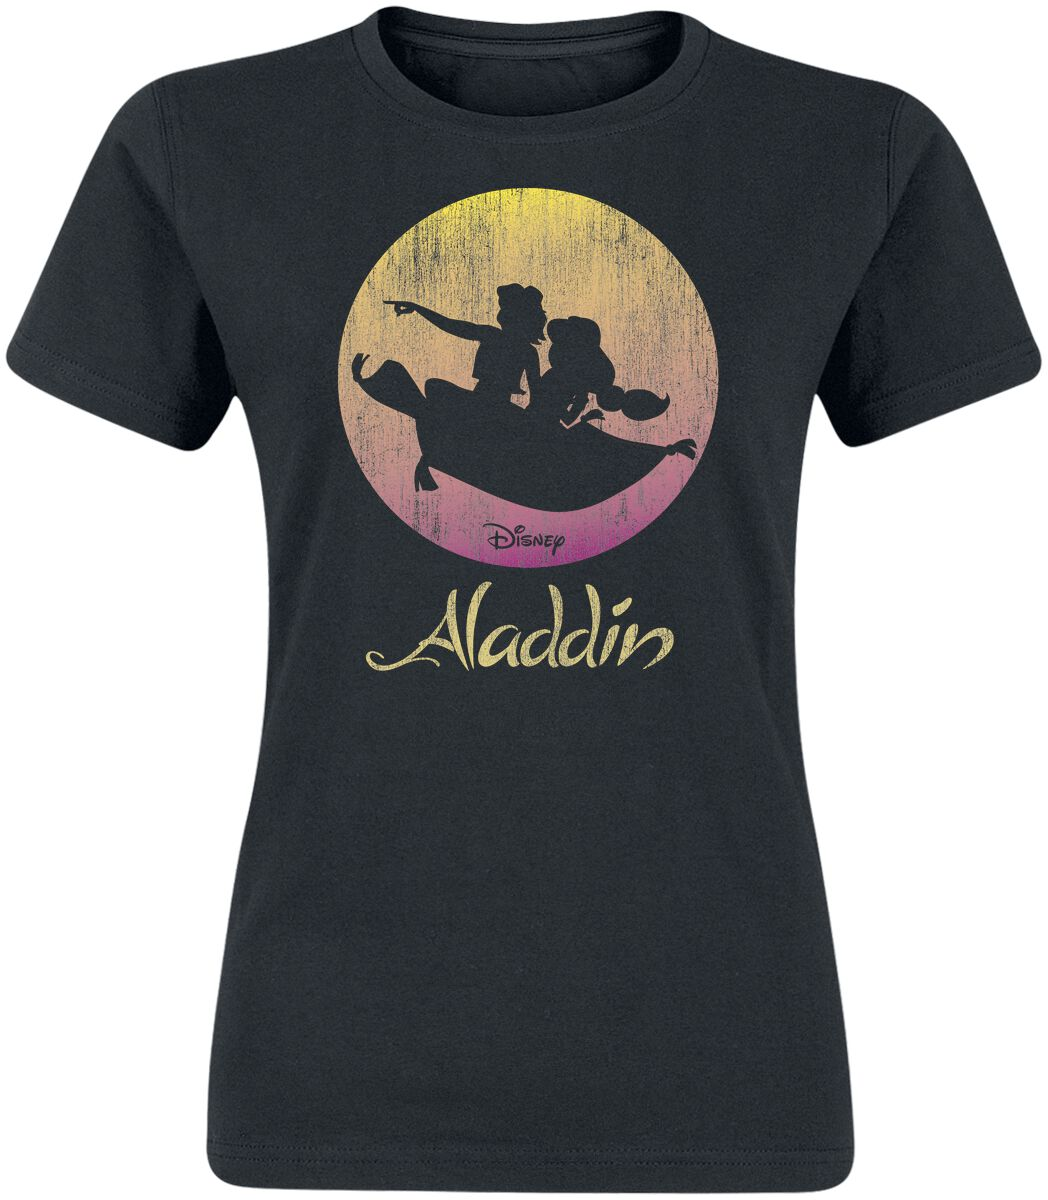 Image of Aladdin Flying Sunset Girl-Shirt schwarz